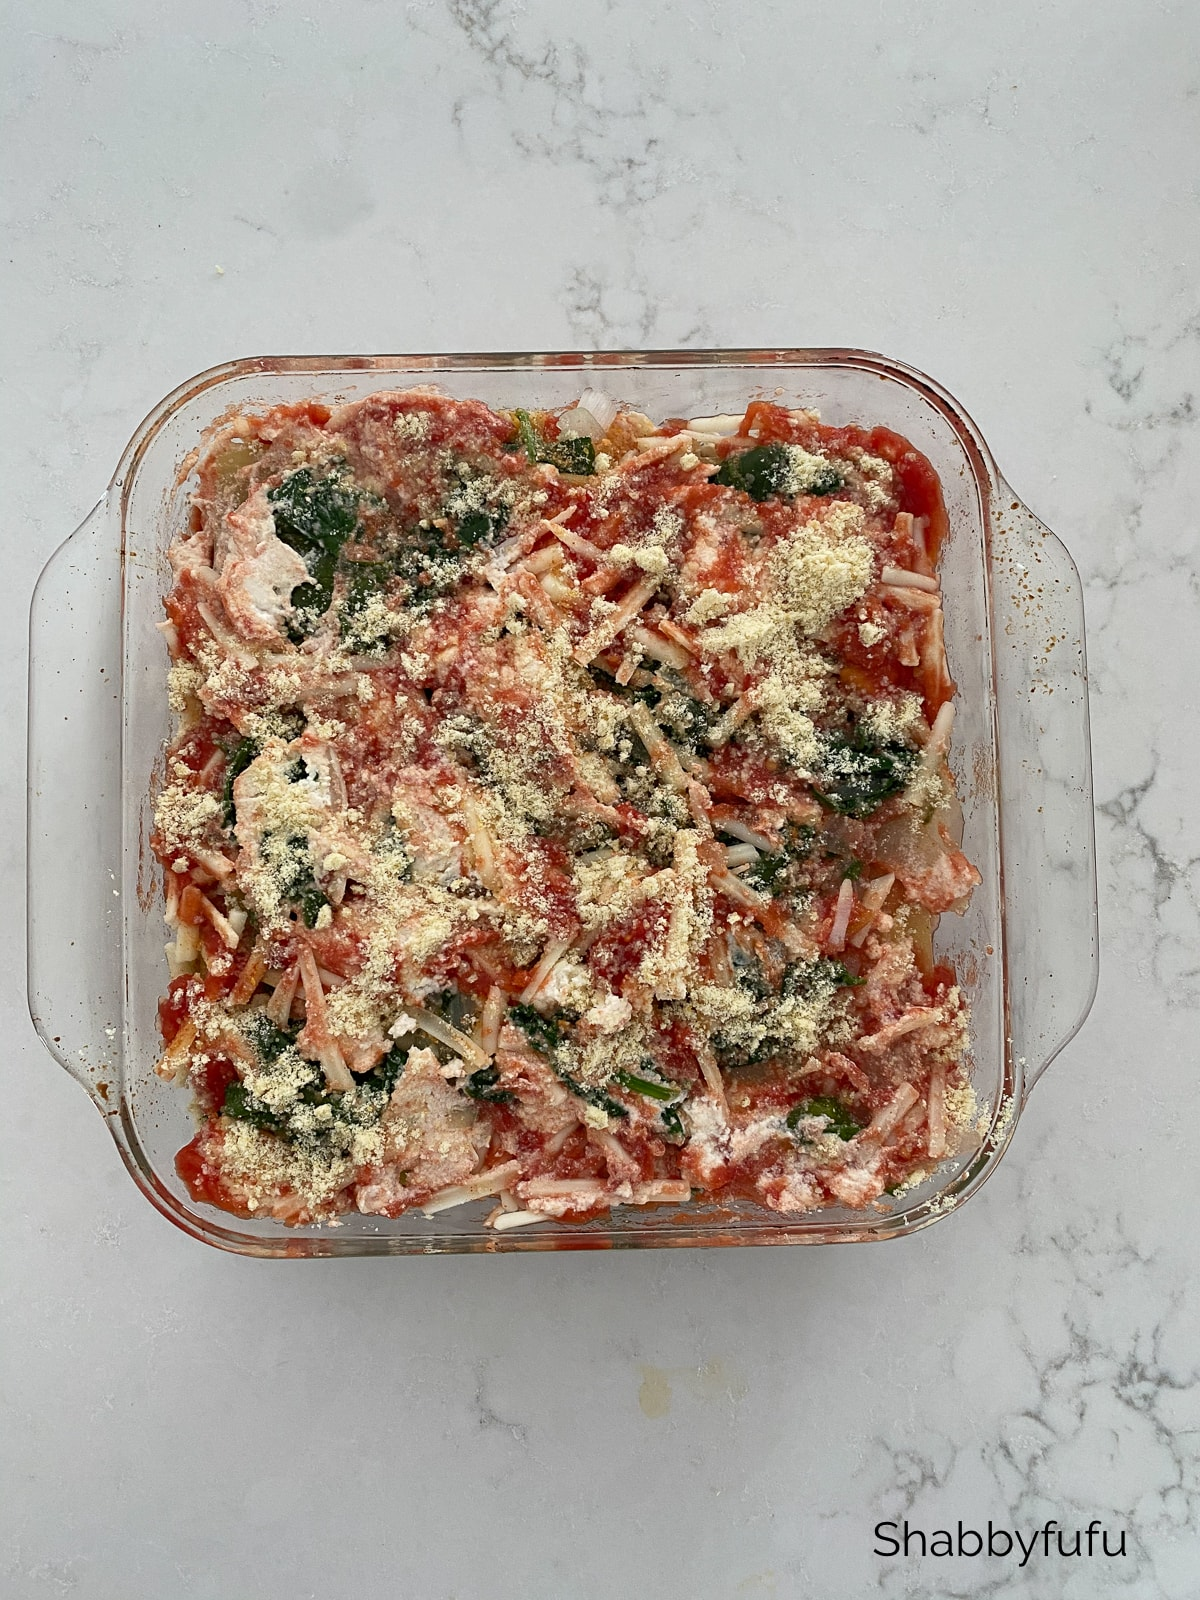 The BEST vegan lasagna that I've perfected!